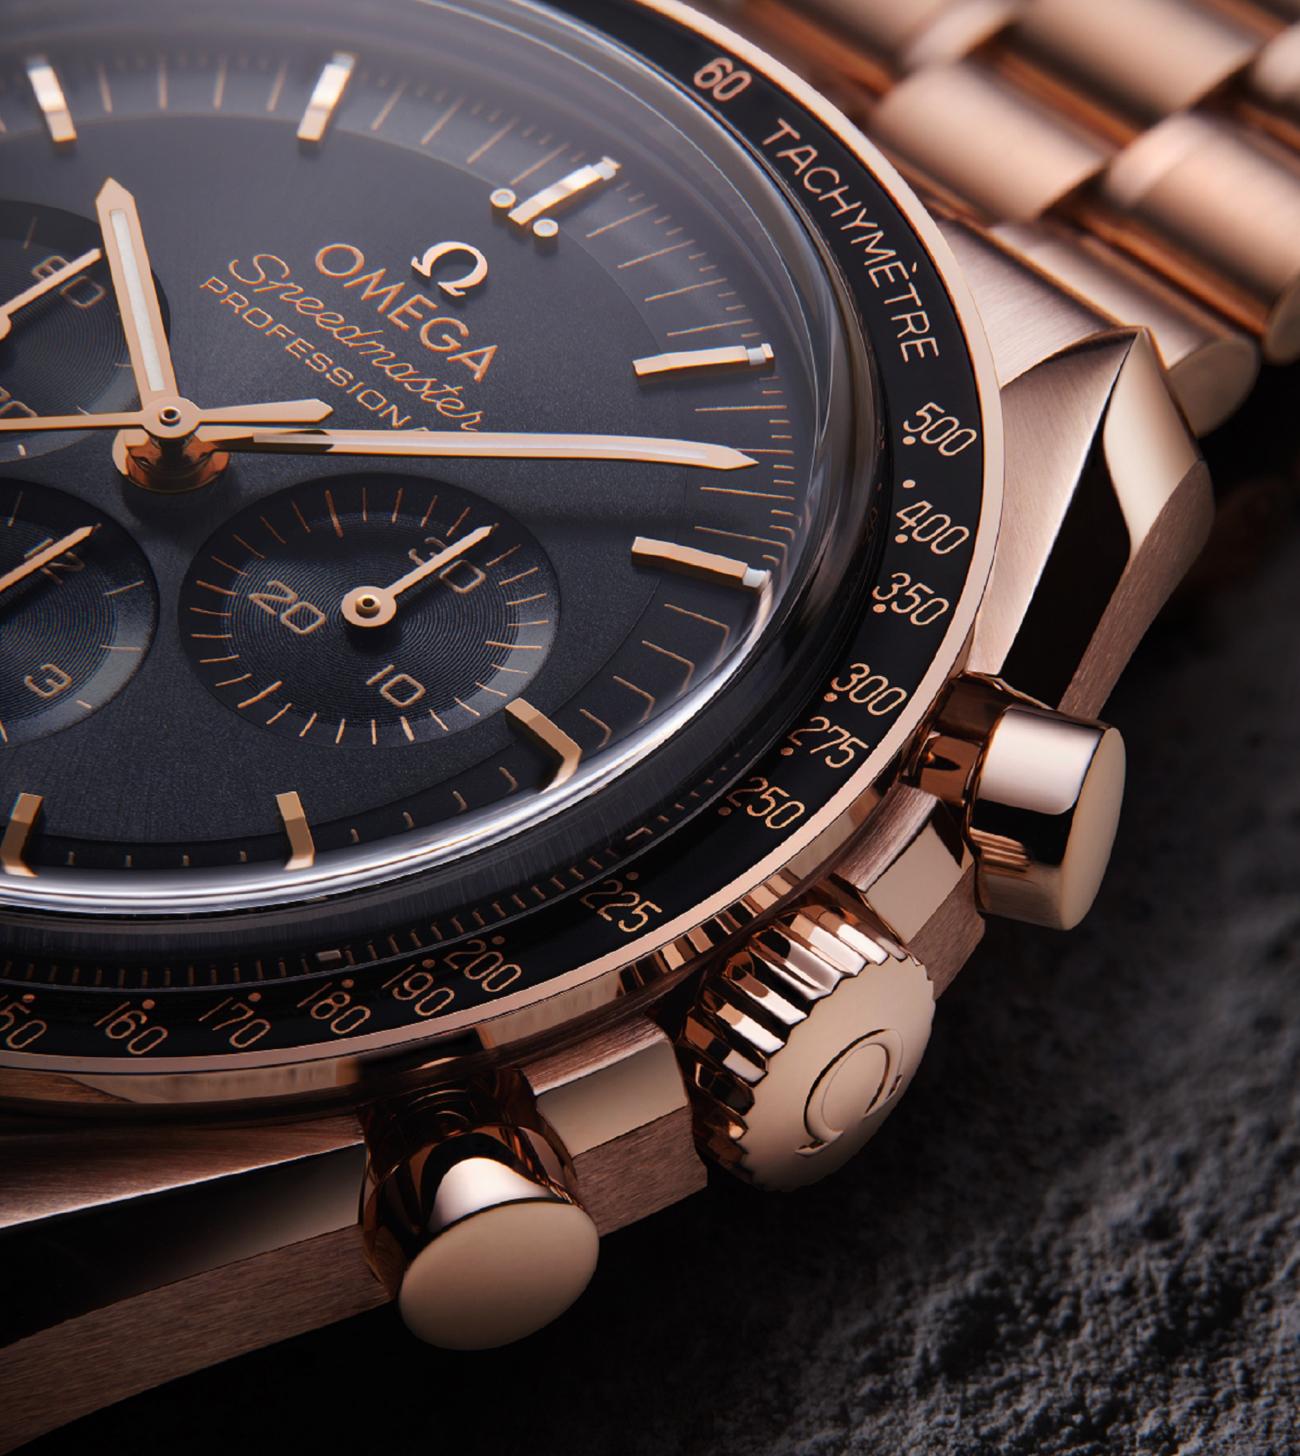 omega_master_chronometer_certified_dial-_europa_star_magazine_2021